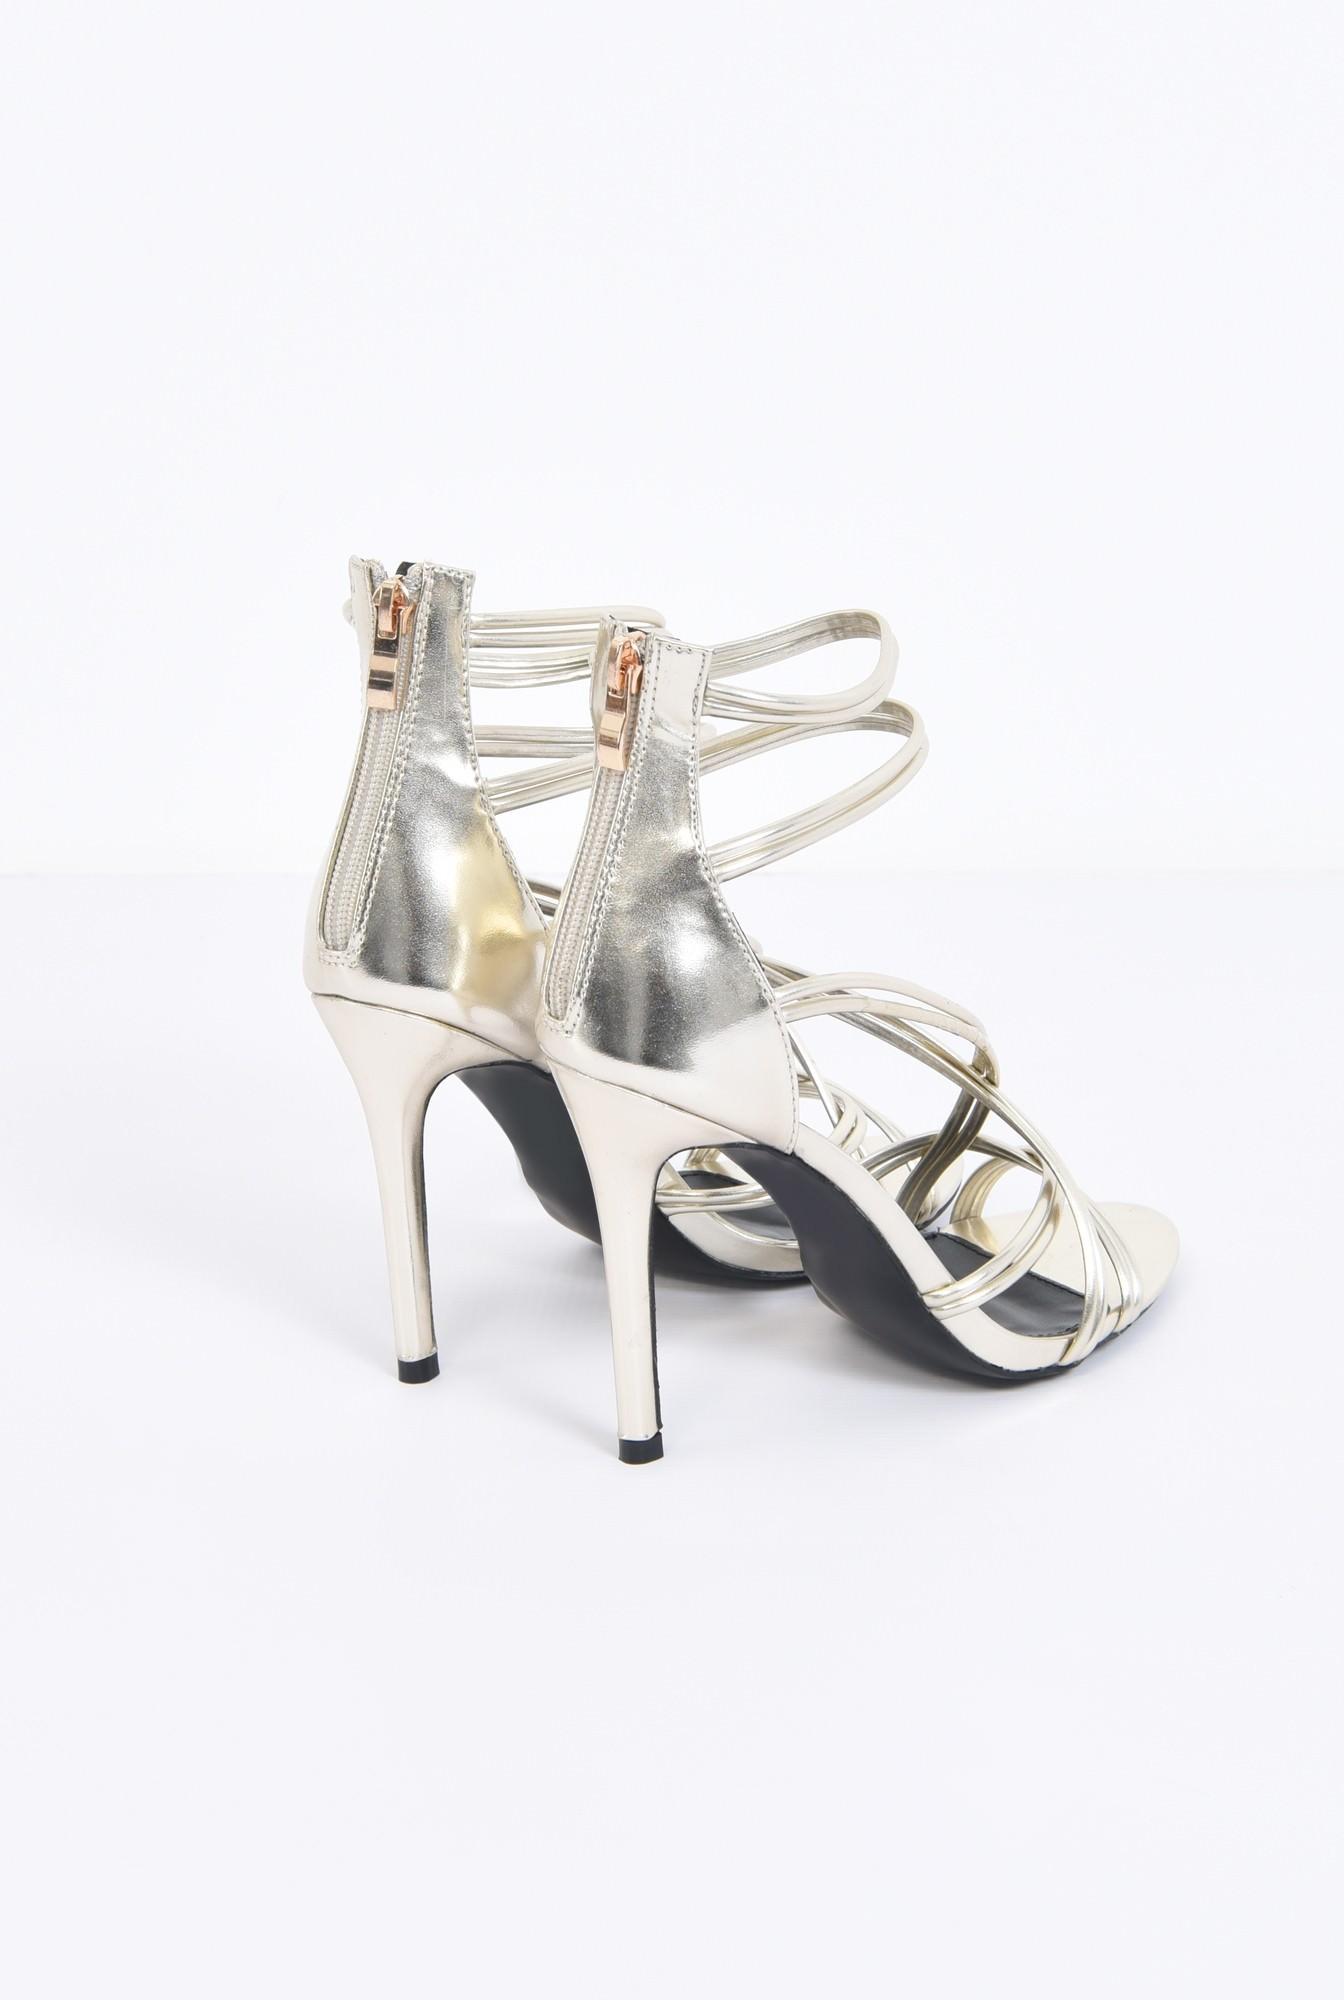 2 - sandale de ocazie, toc inalt, barete subtiri